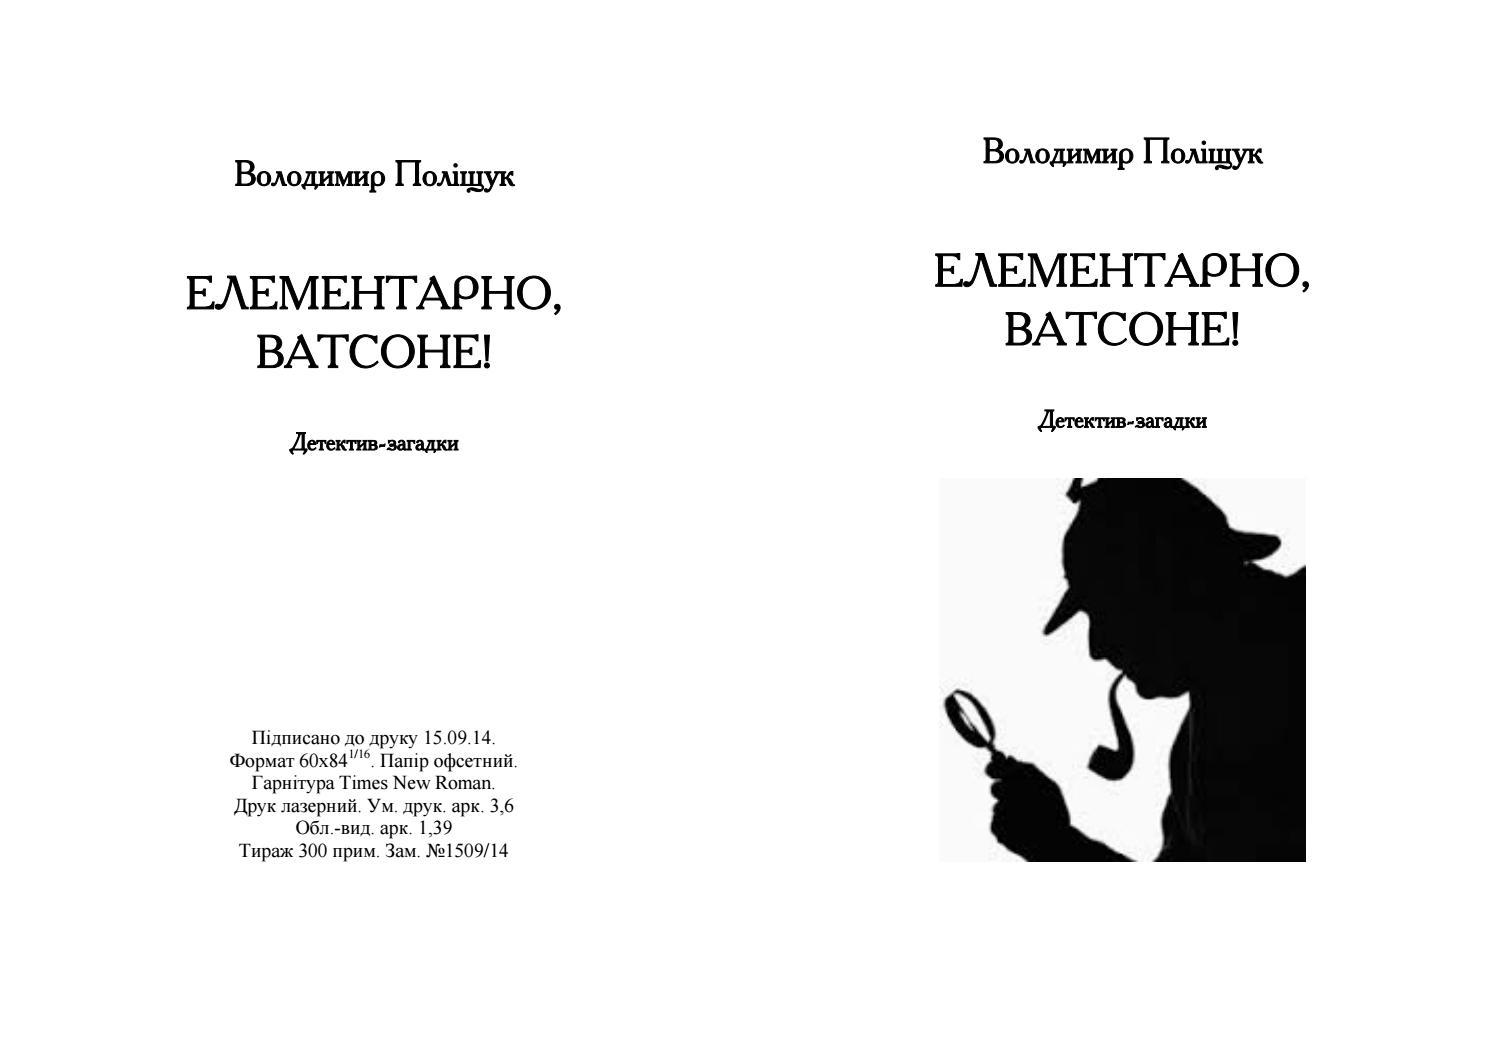 Володимир Поліщук. ЕЛЕМЕНТАРНО ba546797a0da7